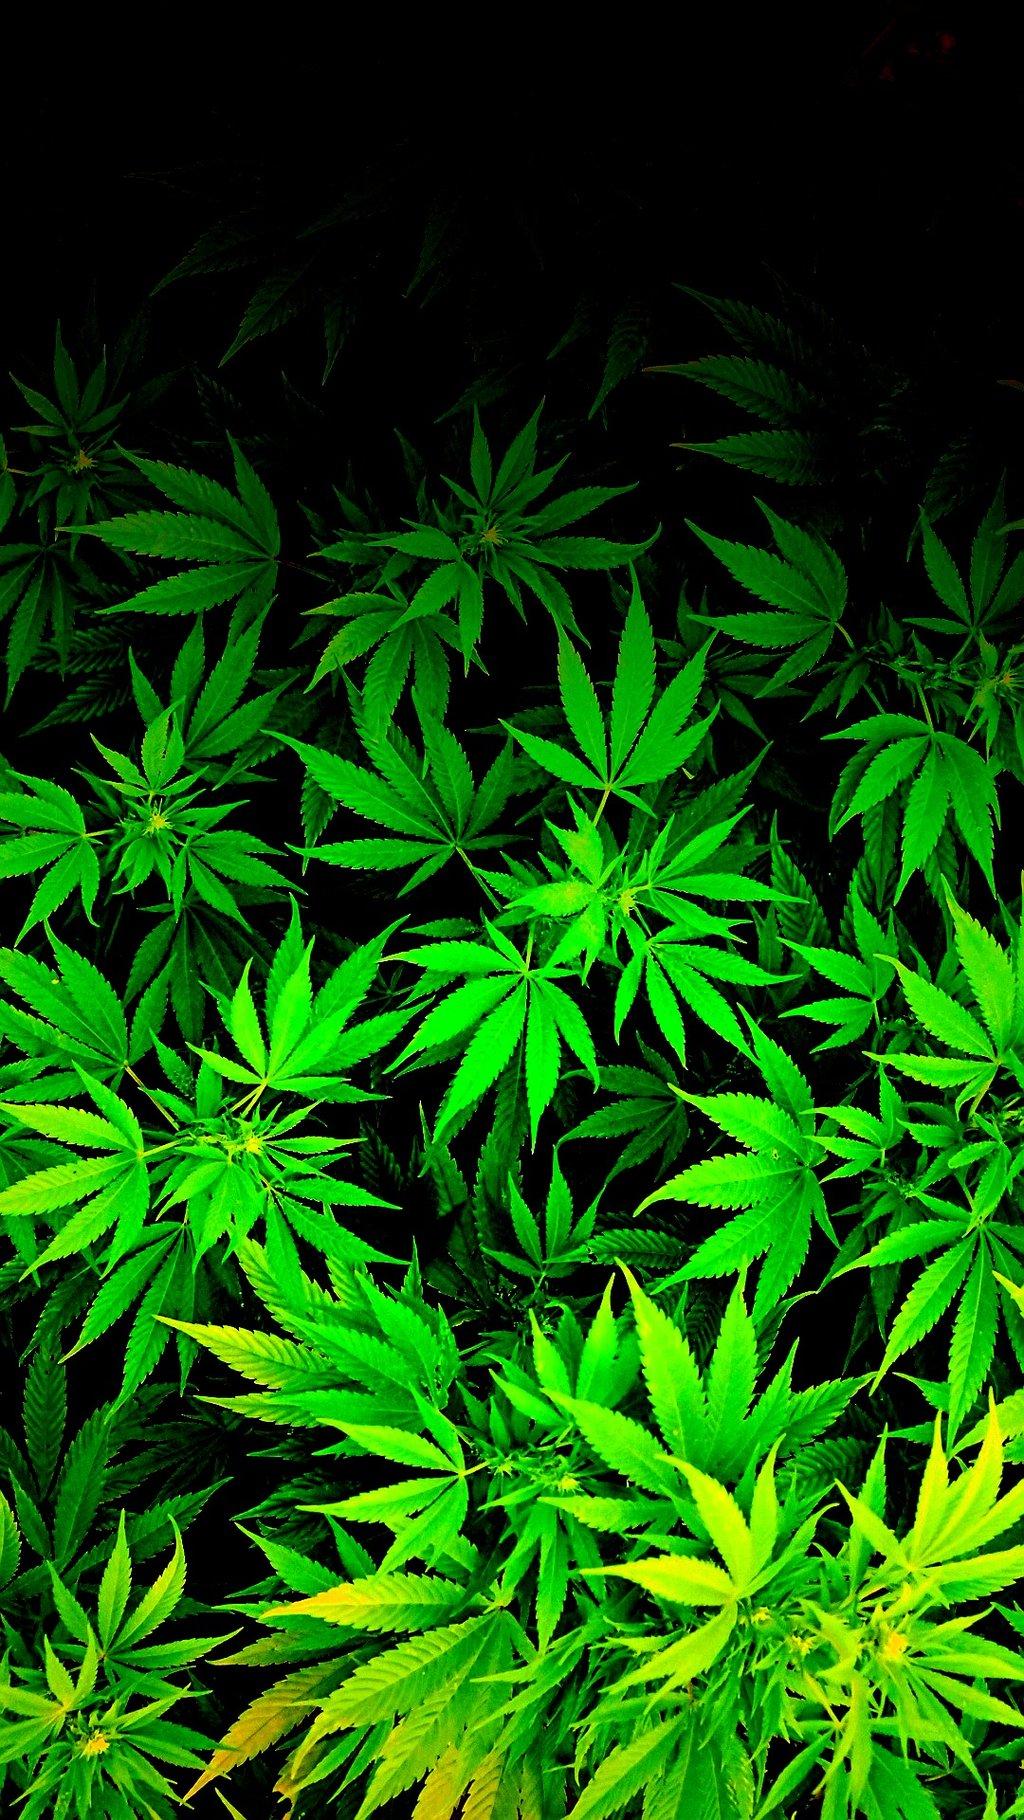 weed marijuana cannabis wallpaper by thetruemask fan art wallpaper 1024x1820